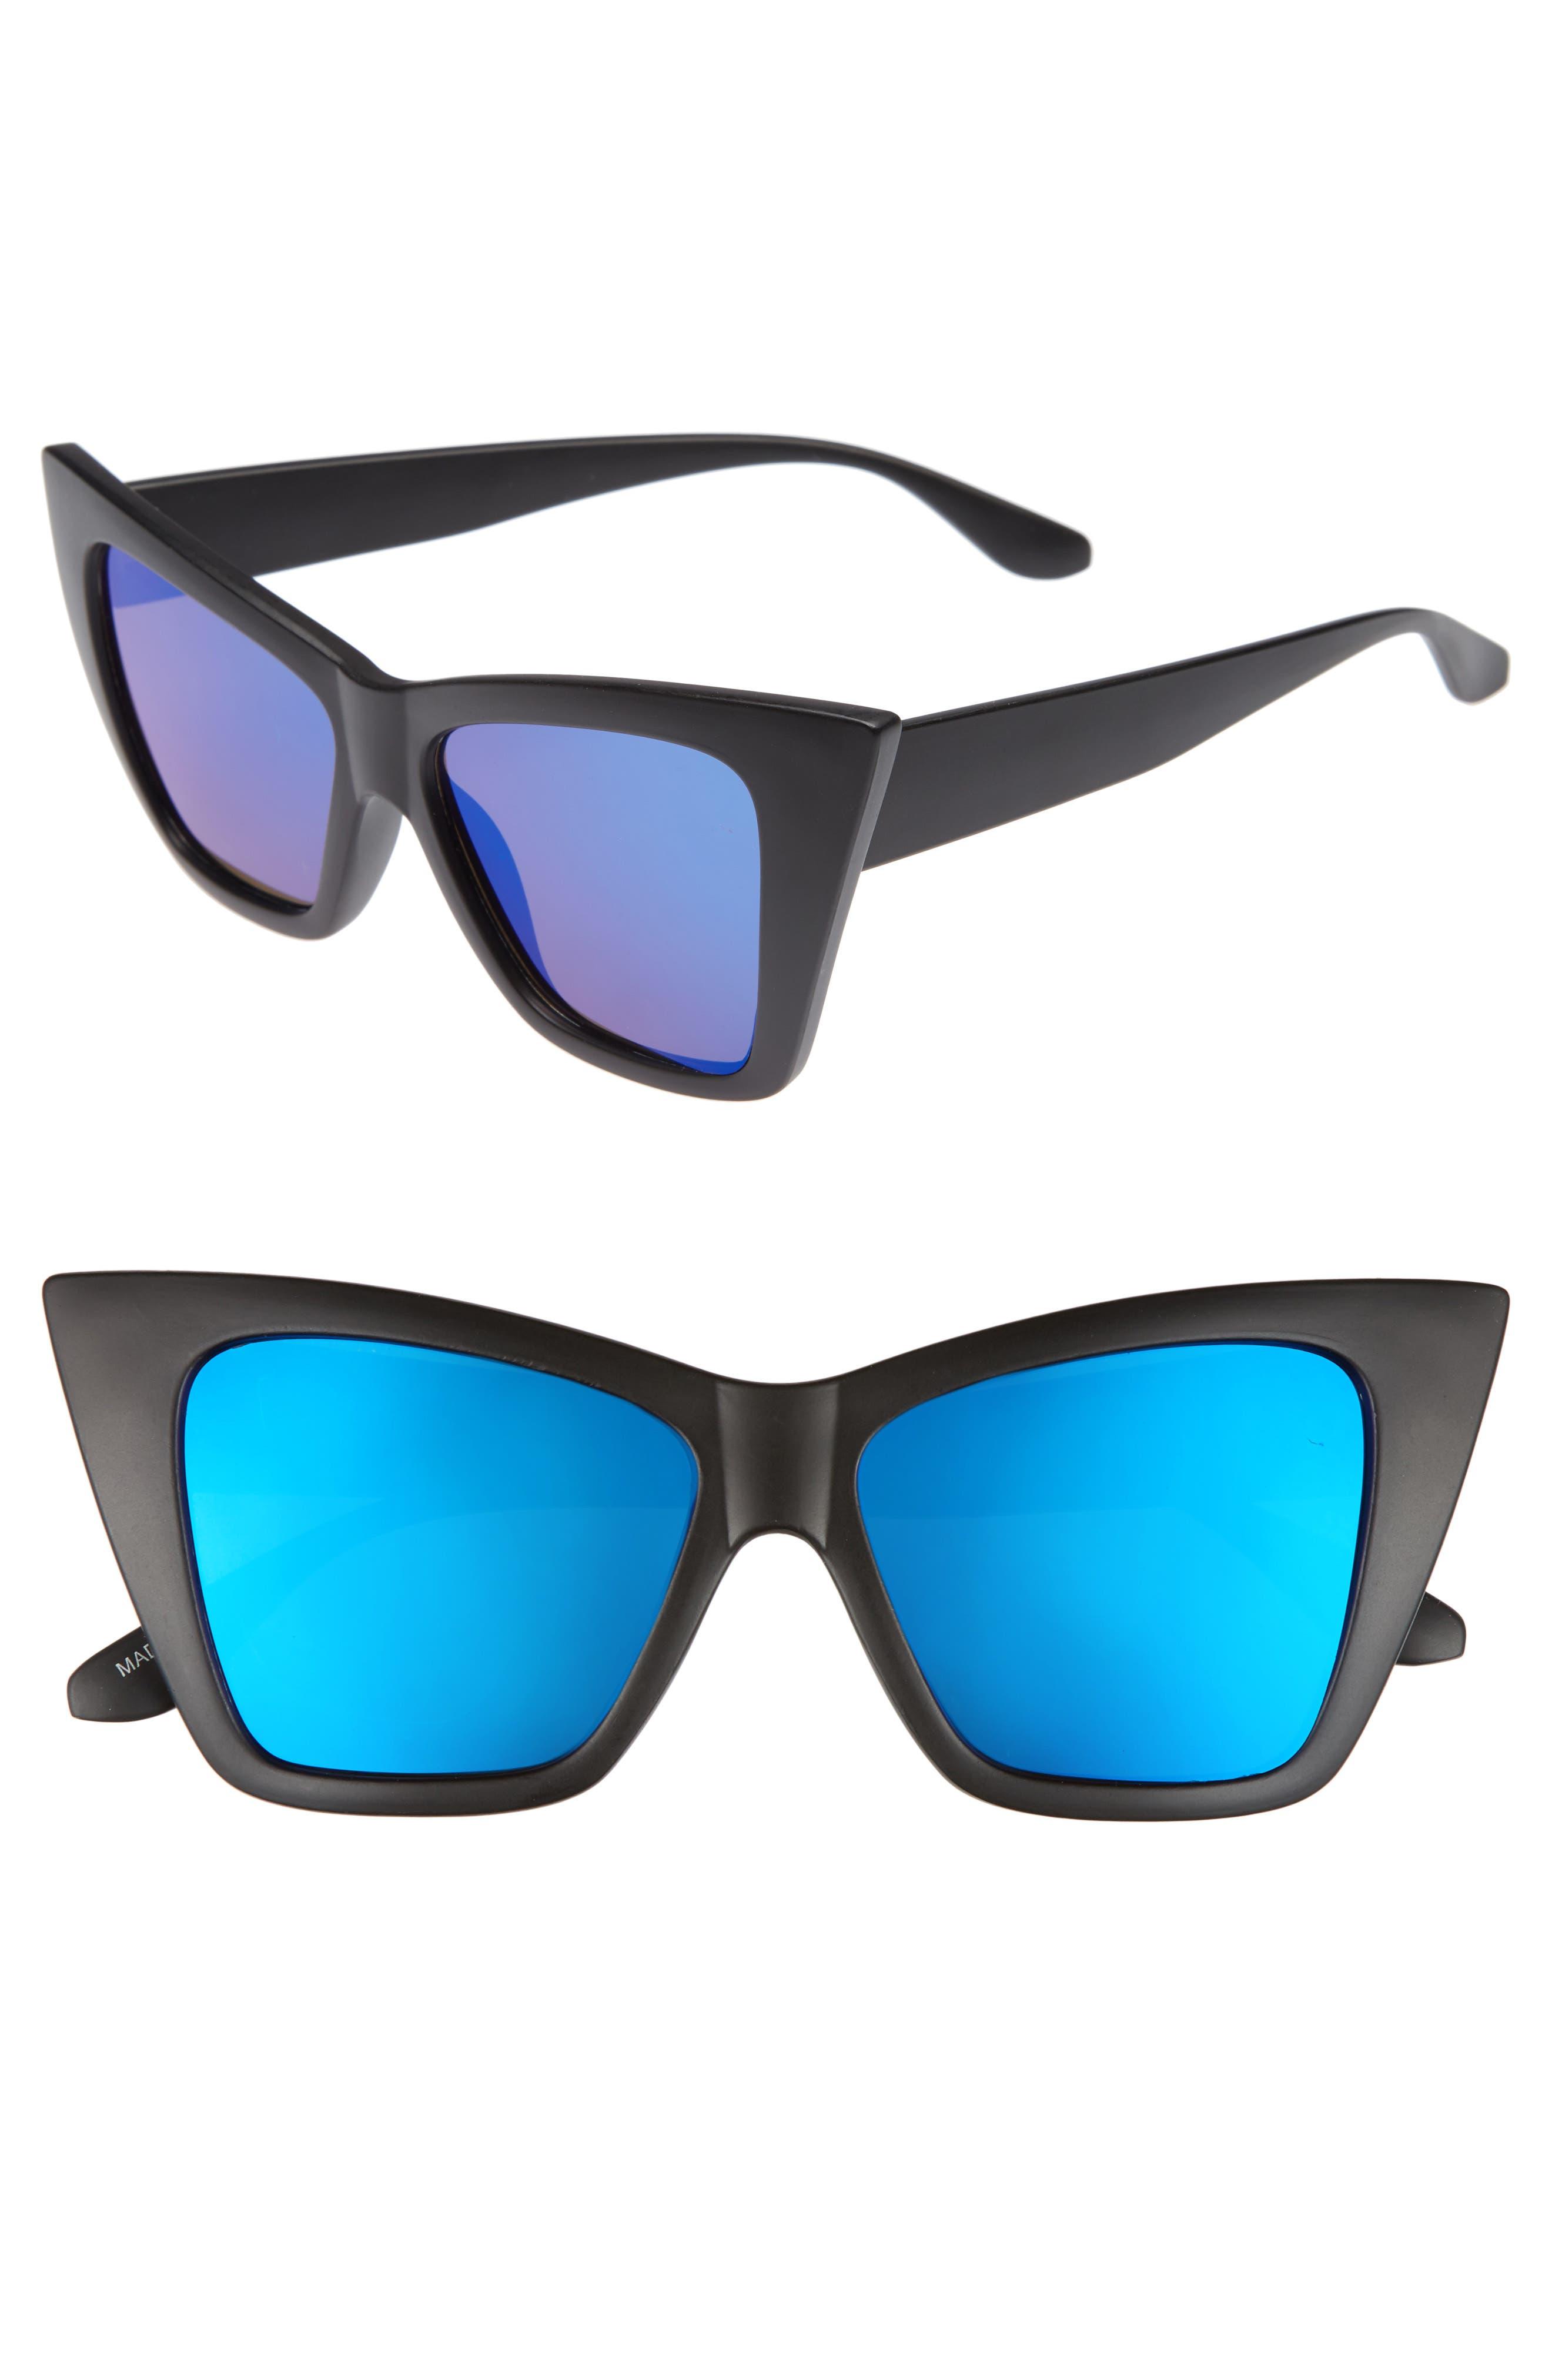 Main Image - BP. 66mm Oversize Cat Eye Sunglasses